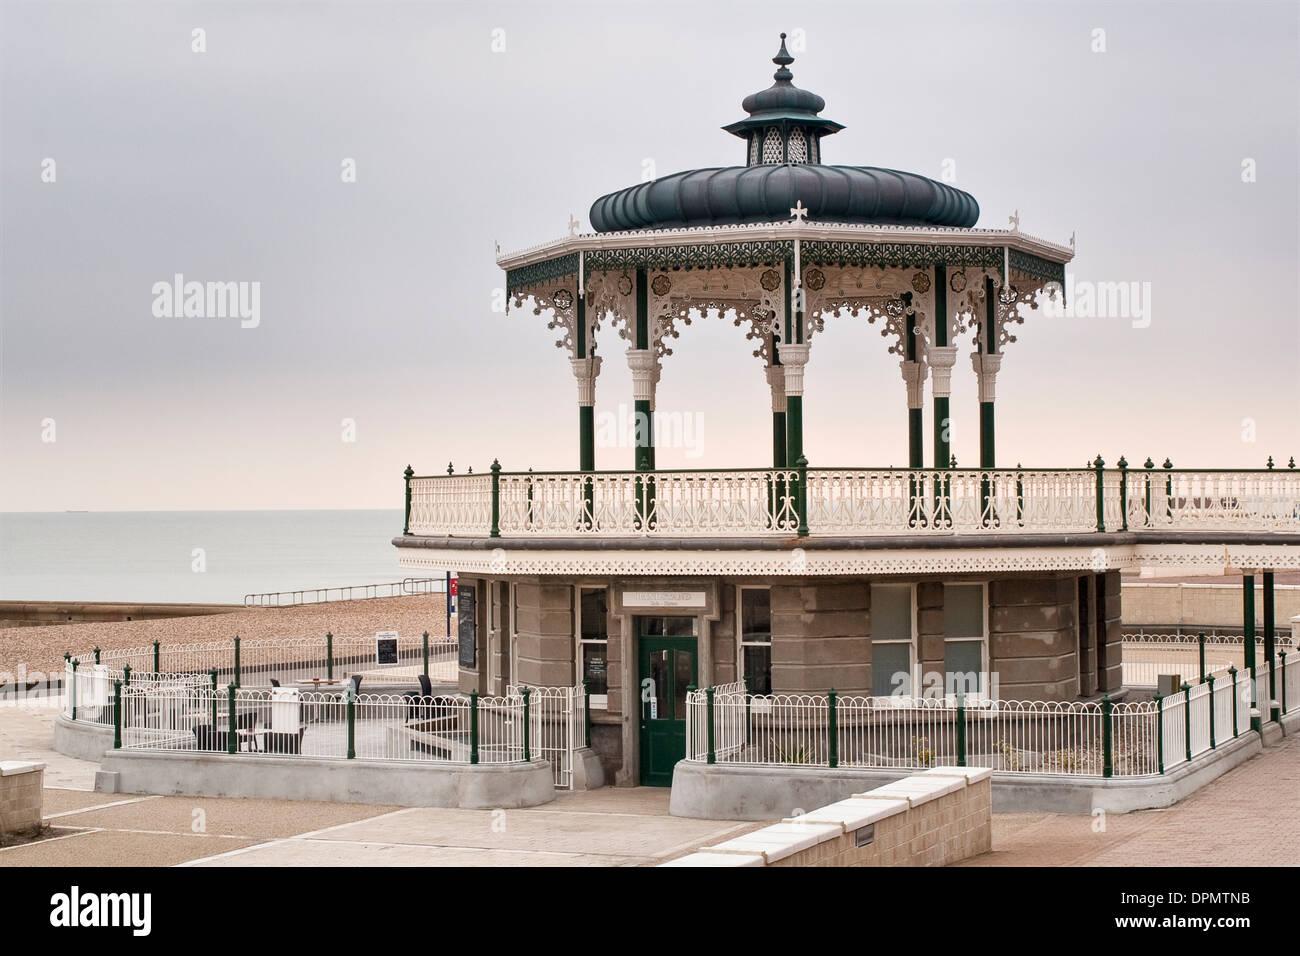 King's Road Bandstand Brighton Victorian cast iron Promenade structure Stock Photo